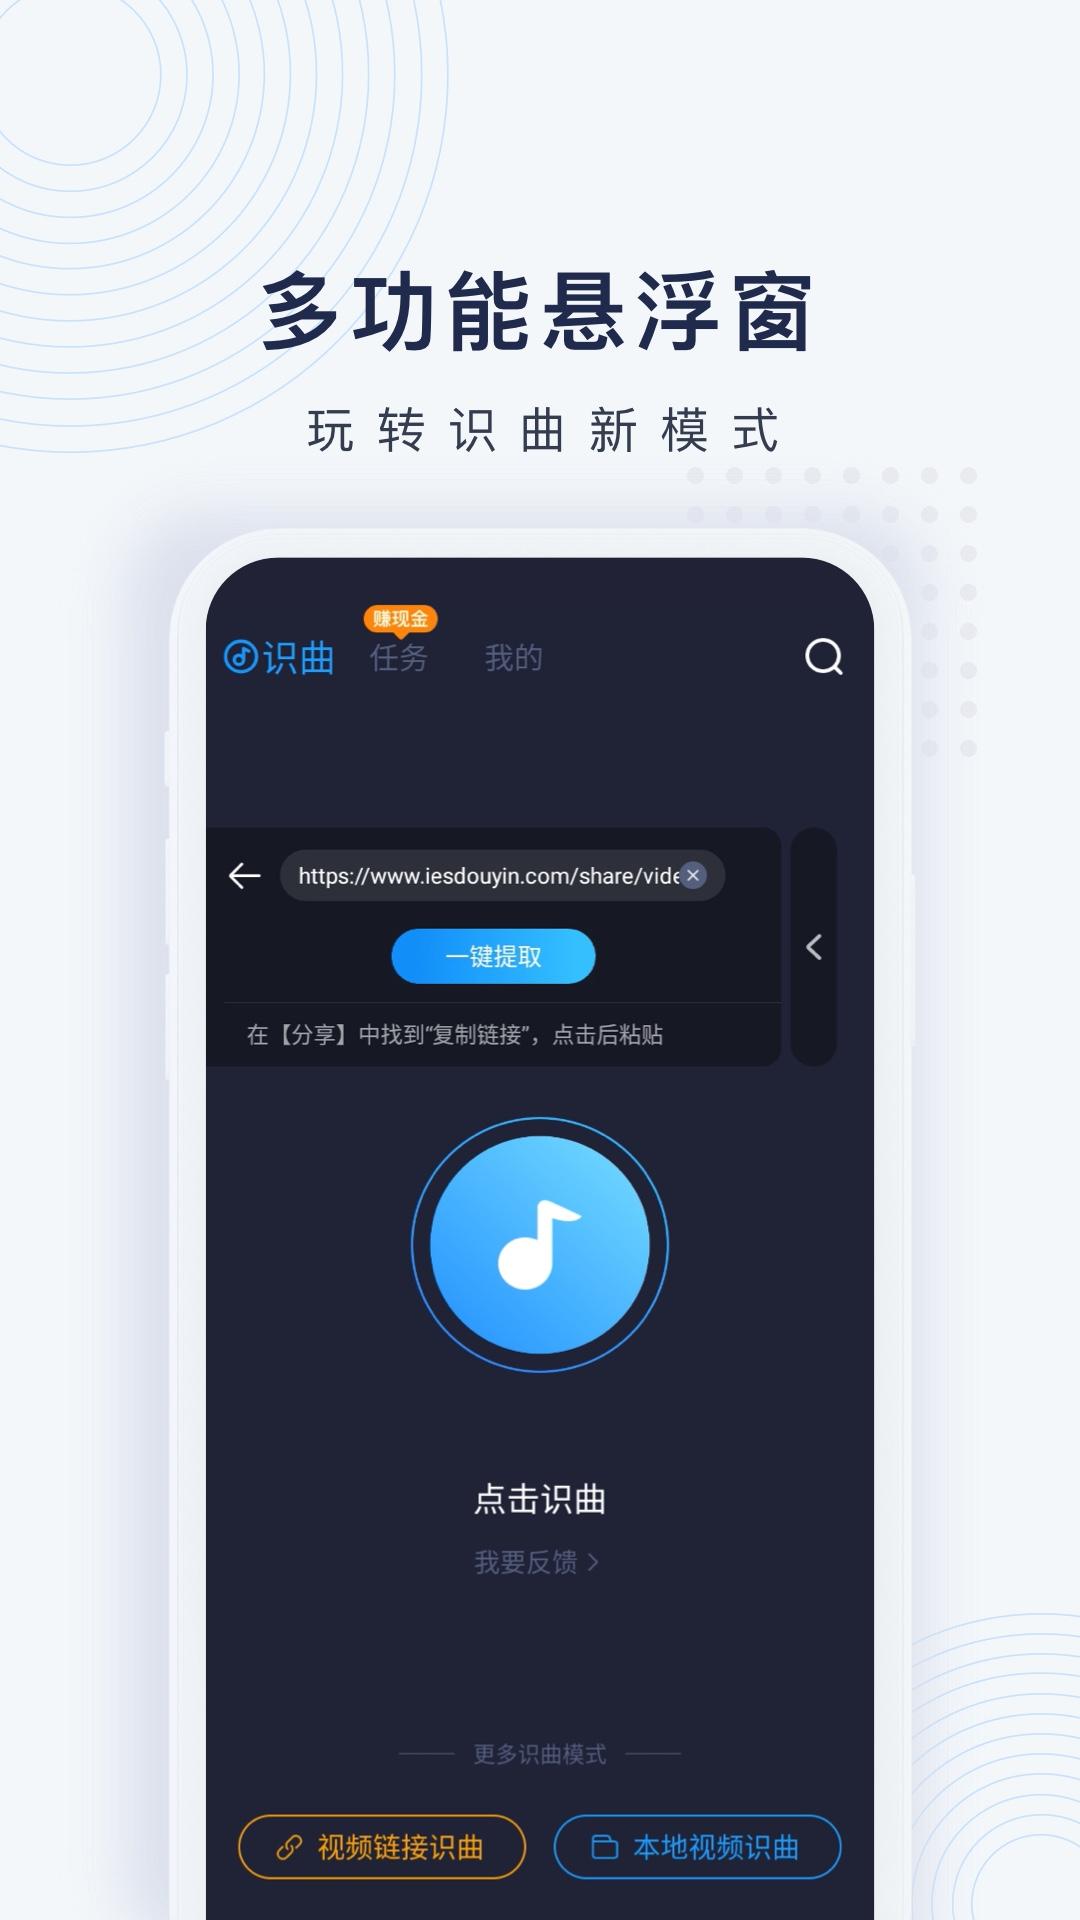 https://android-screenimgs.25pp.com/fs08/2020/11/06/1/110_f29333acab189b03b9470a512b4295a3.jpeg